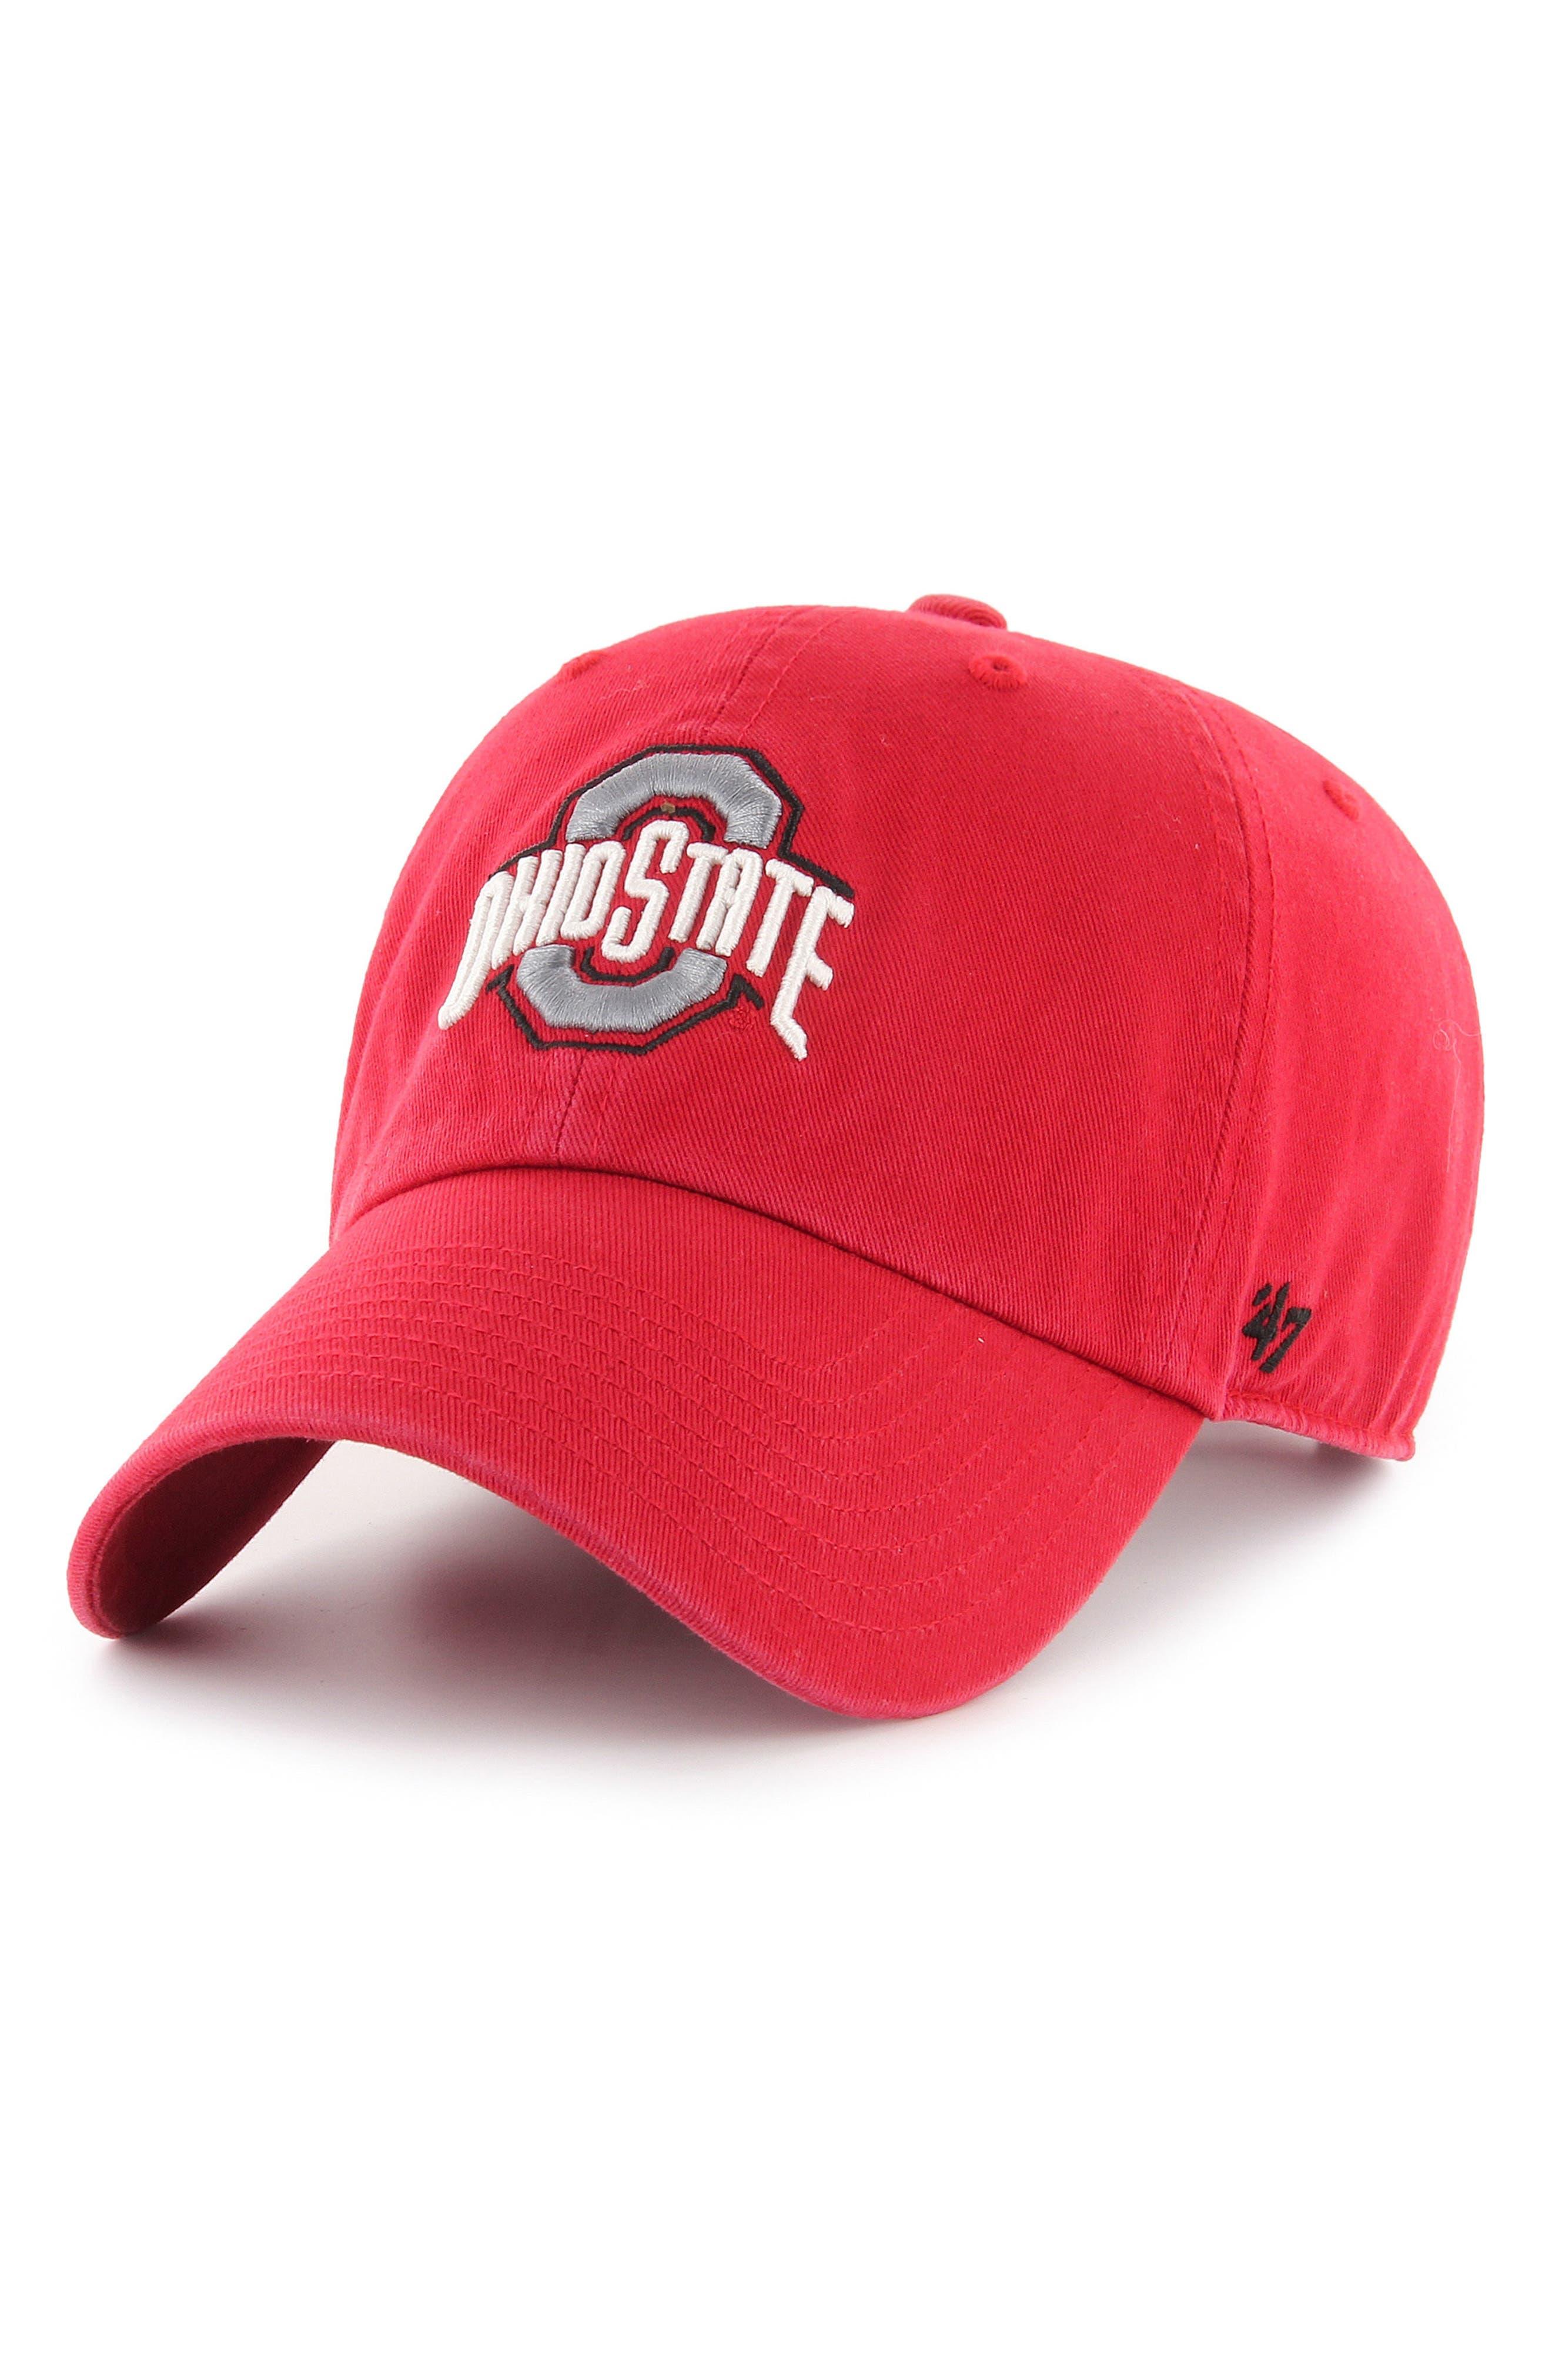 Alternate Image 1 Selected - '47 Clean Up Ohio State Baseball Cap